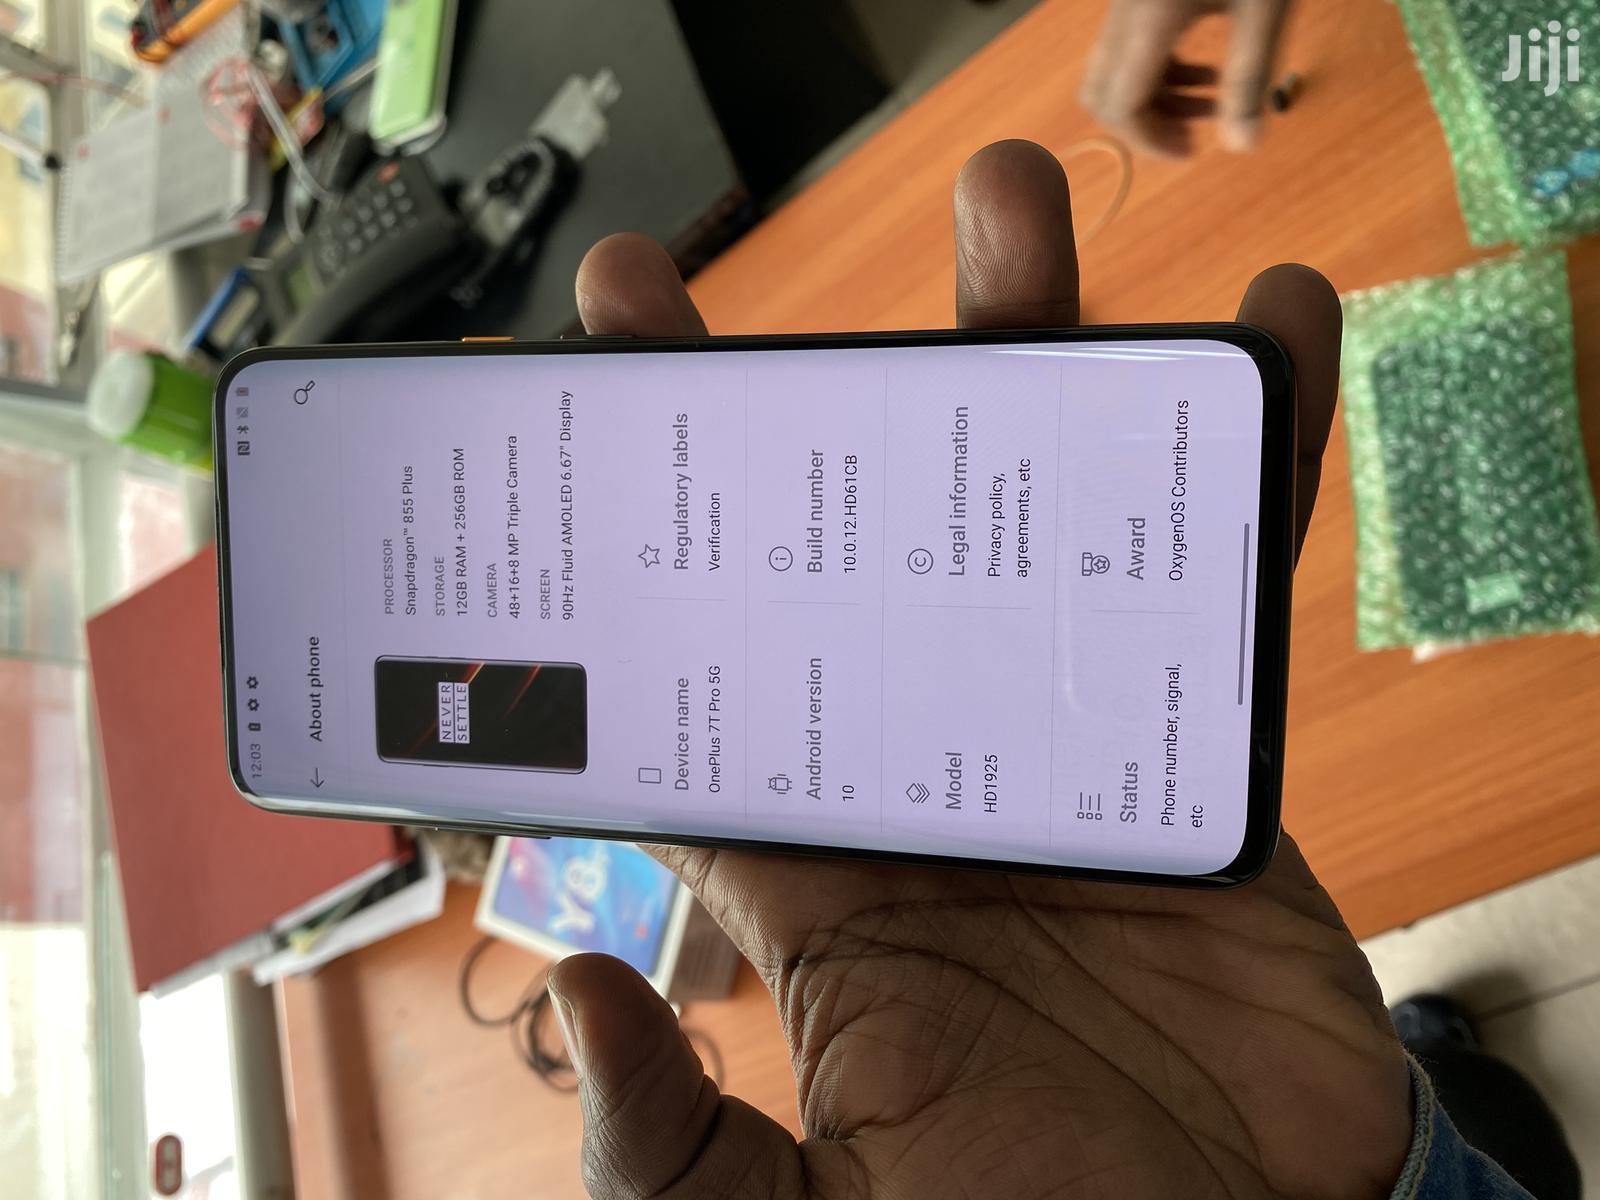 New OnePlus 7T Pro 5G McLaren 256 GB Black | Mobile Phones for sale in Nairobi Central, Nairobi, Kenya